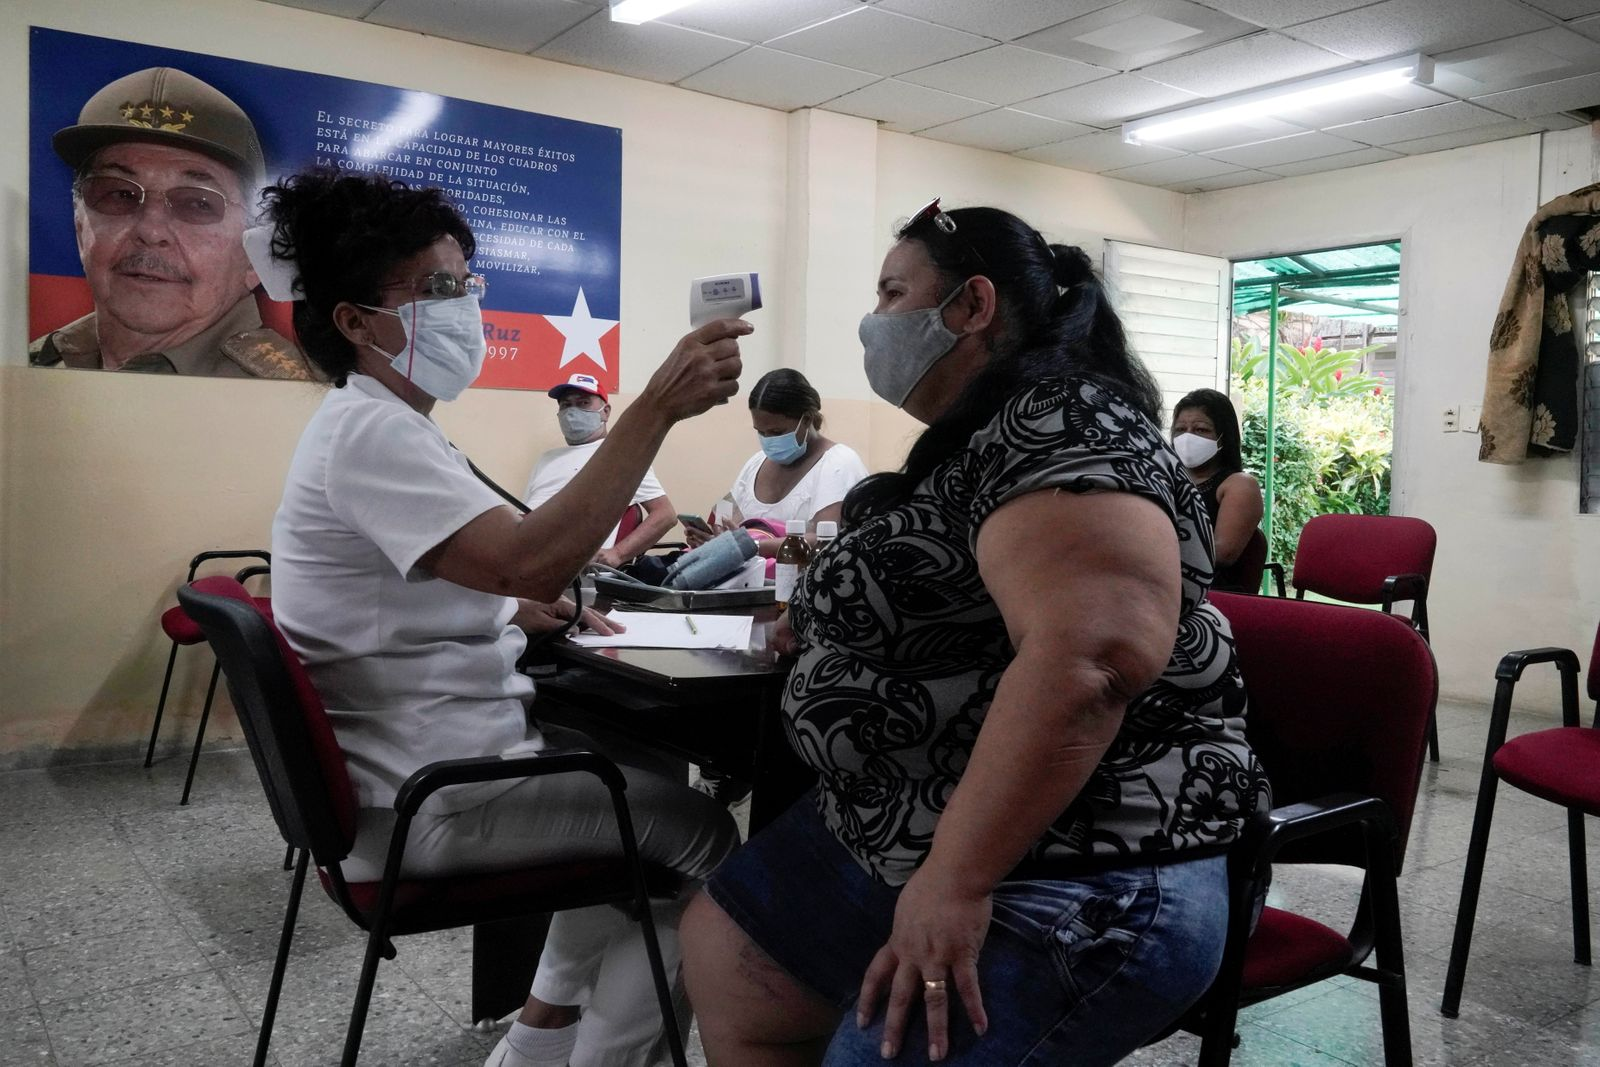 Spread of the coronavirus disease (COVID-19) in Cuba